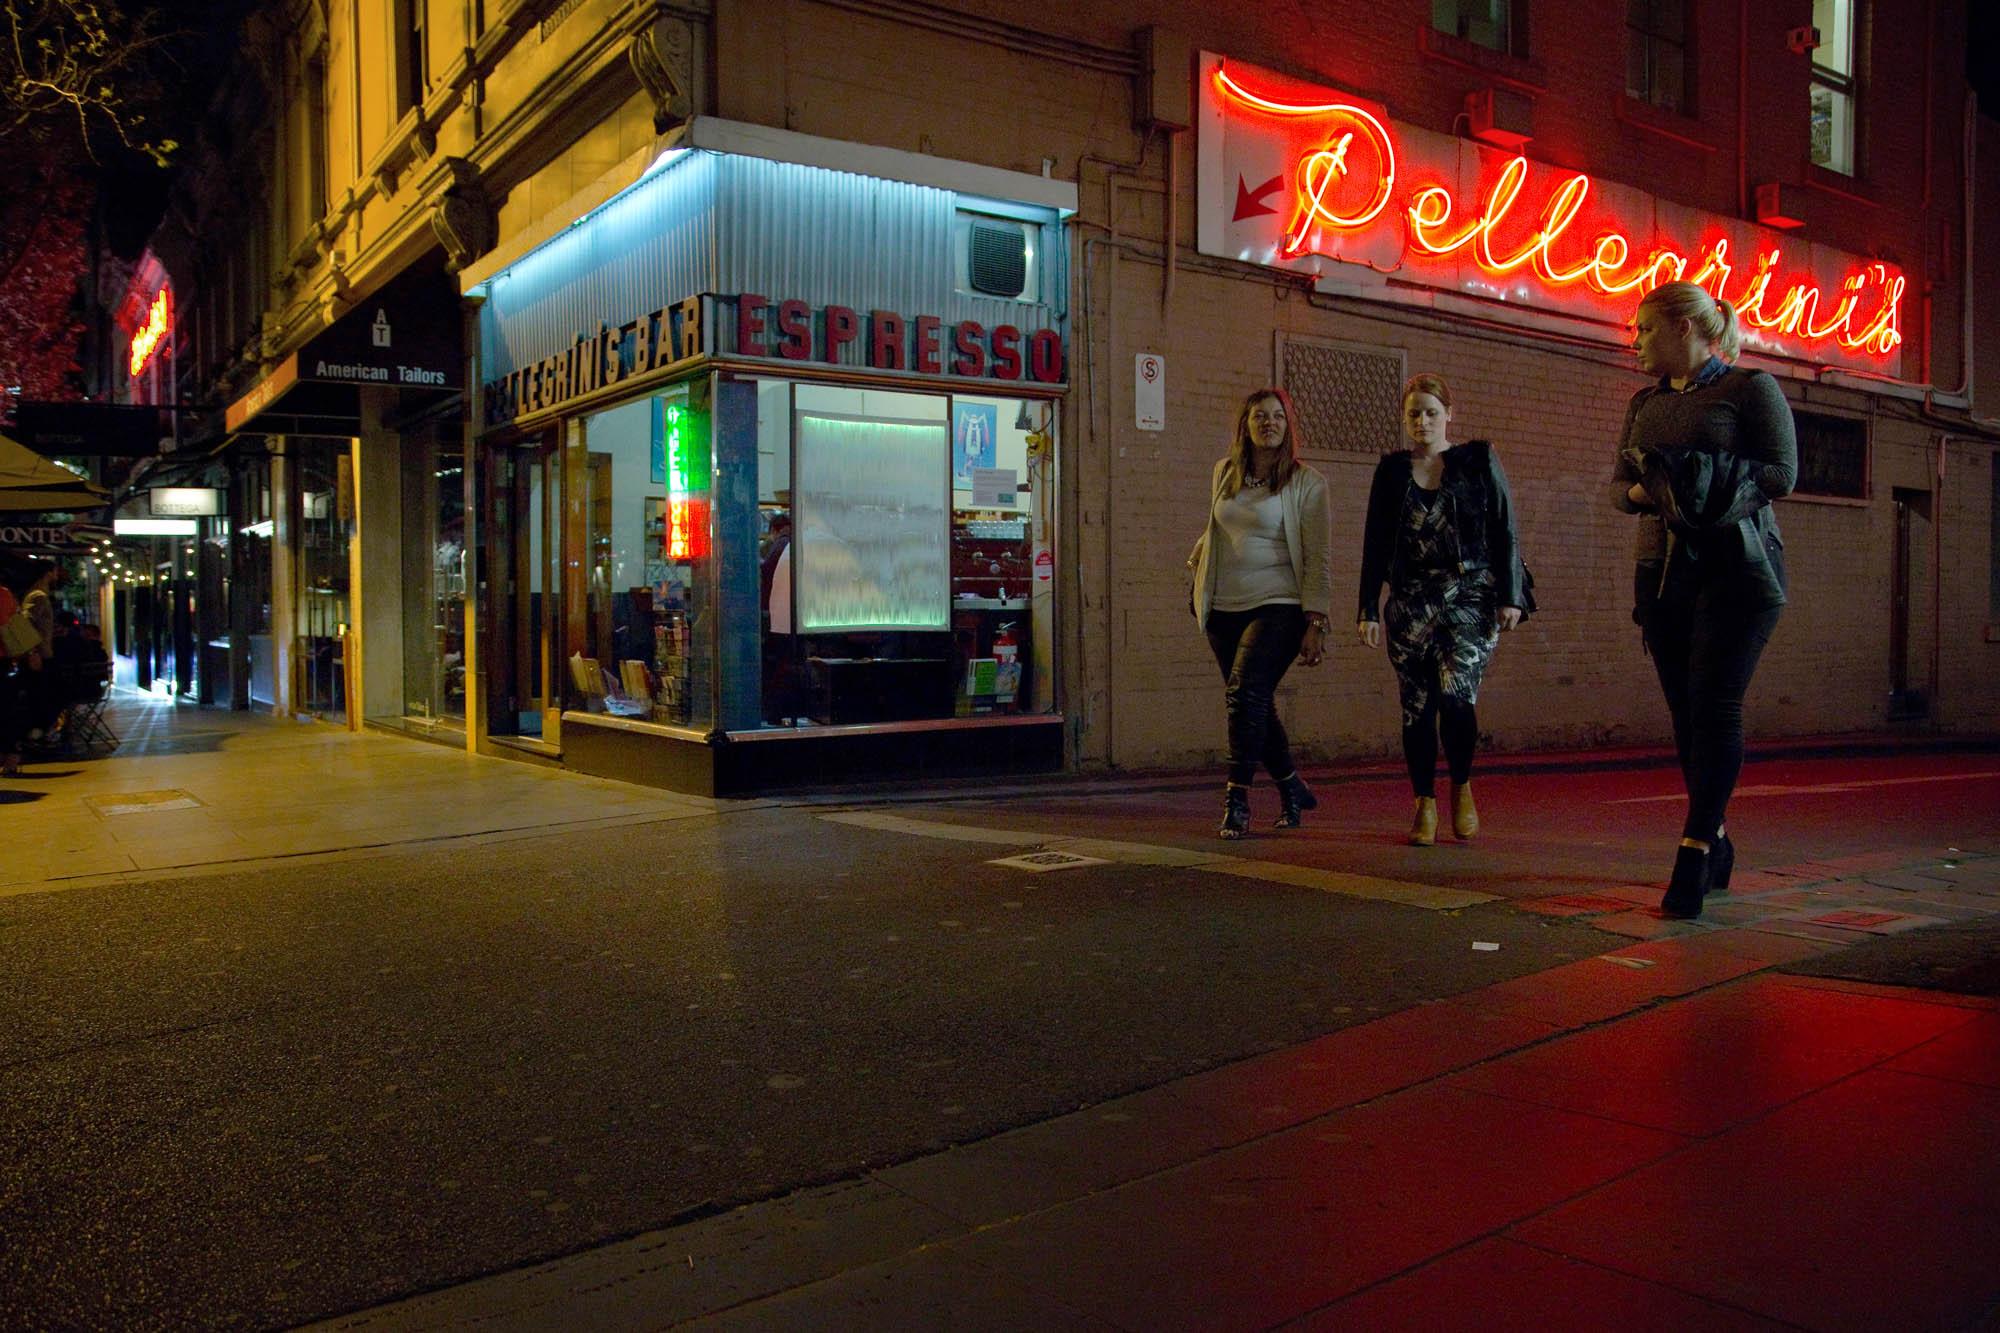 Three people walk past Pellegrini's Espresso Bar, Melbourne, Australia